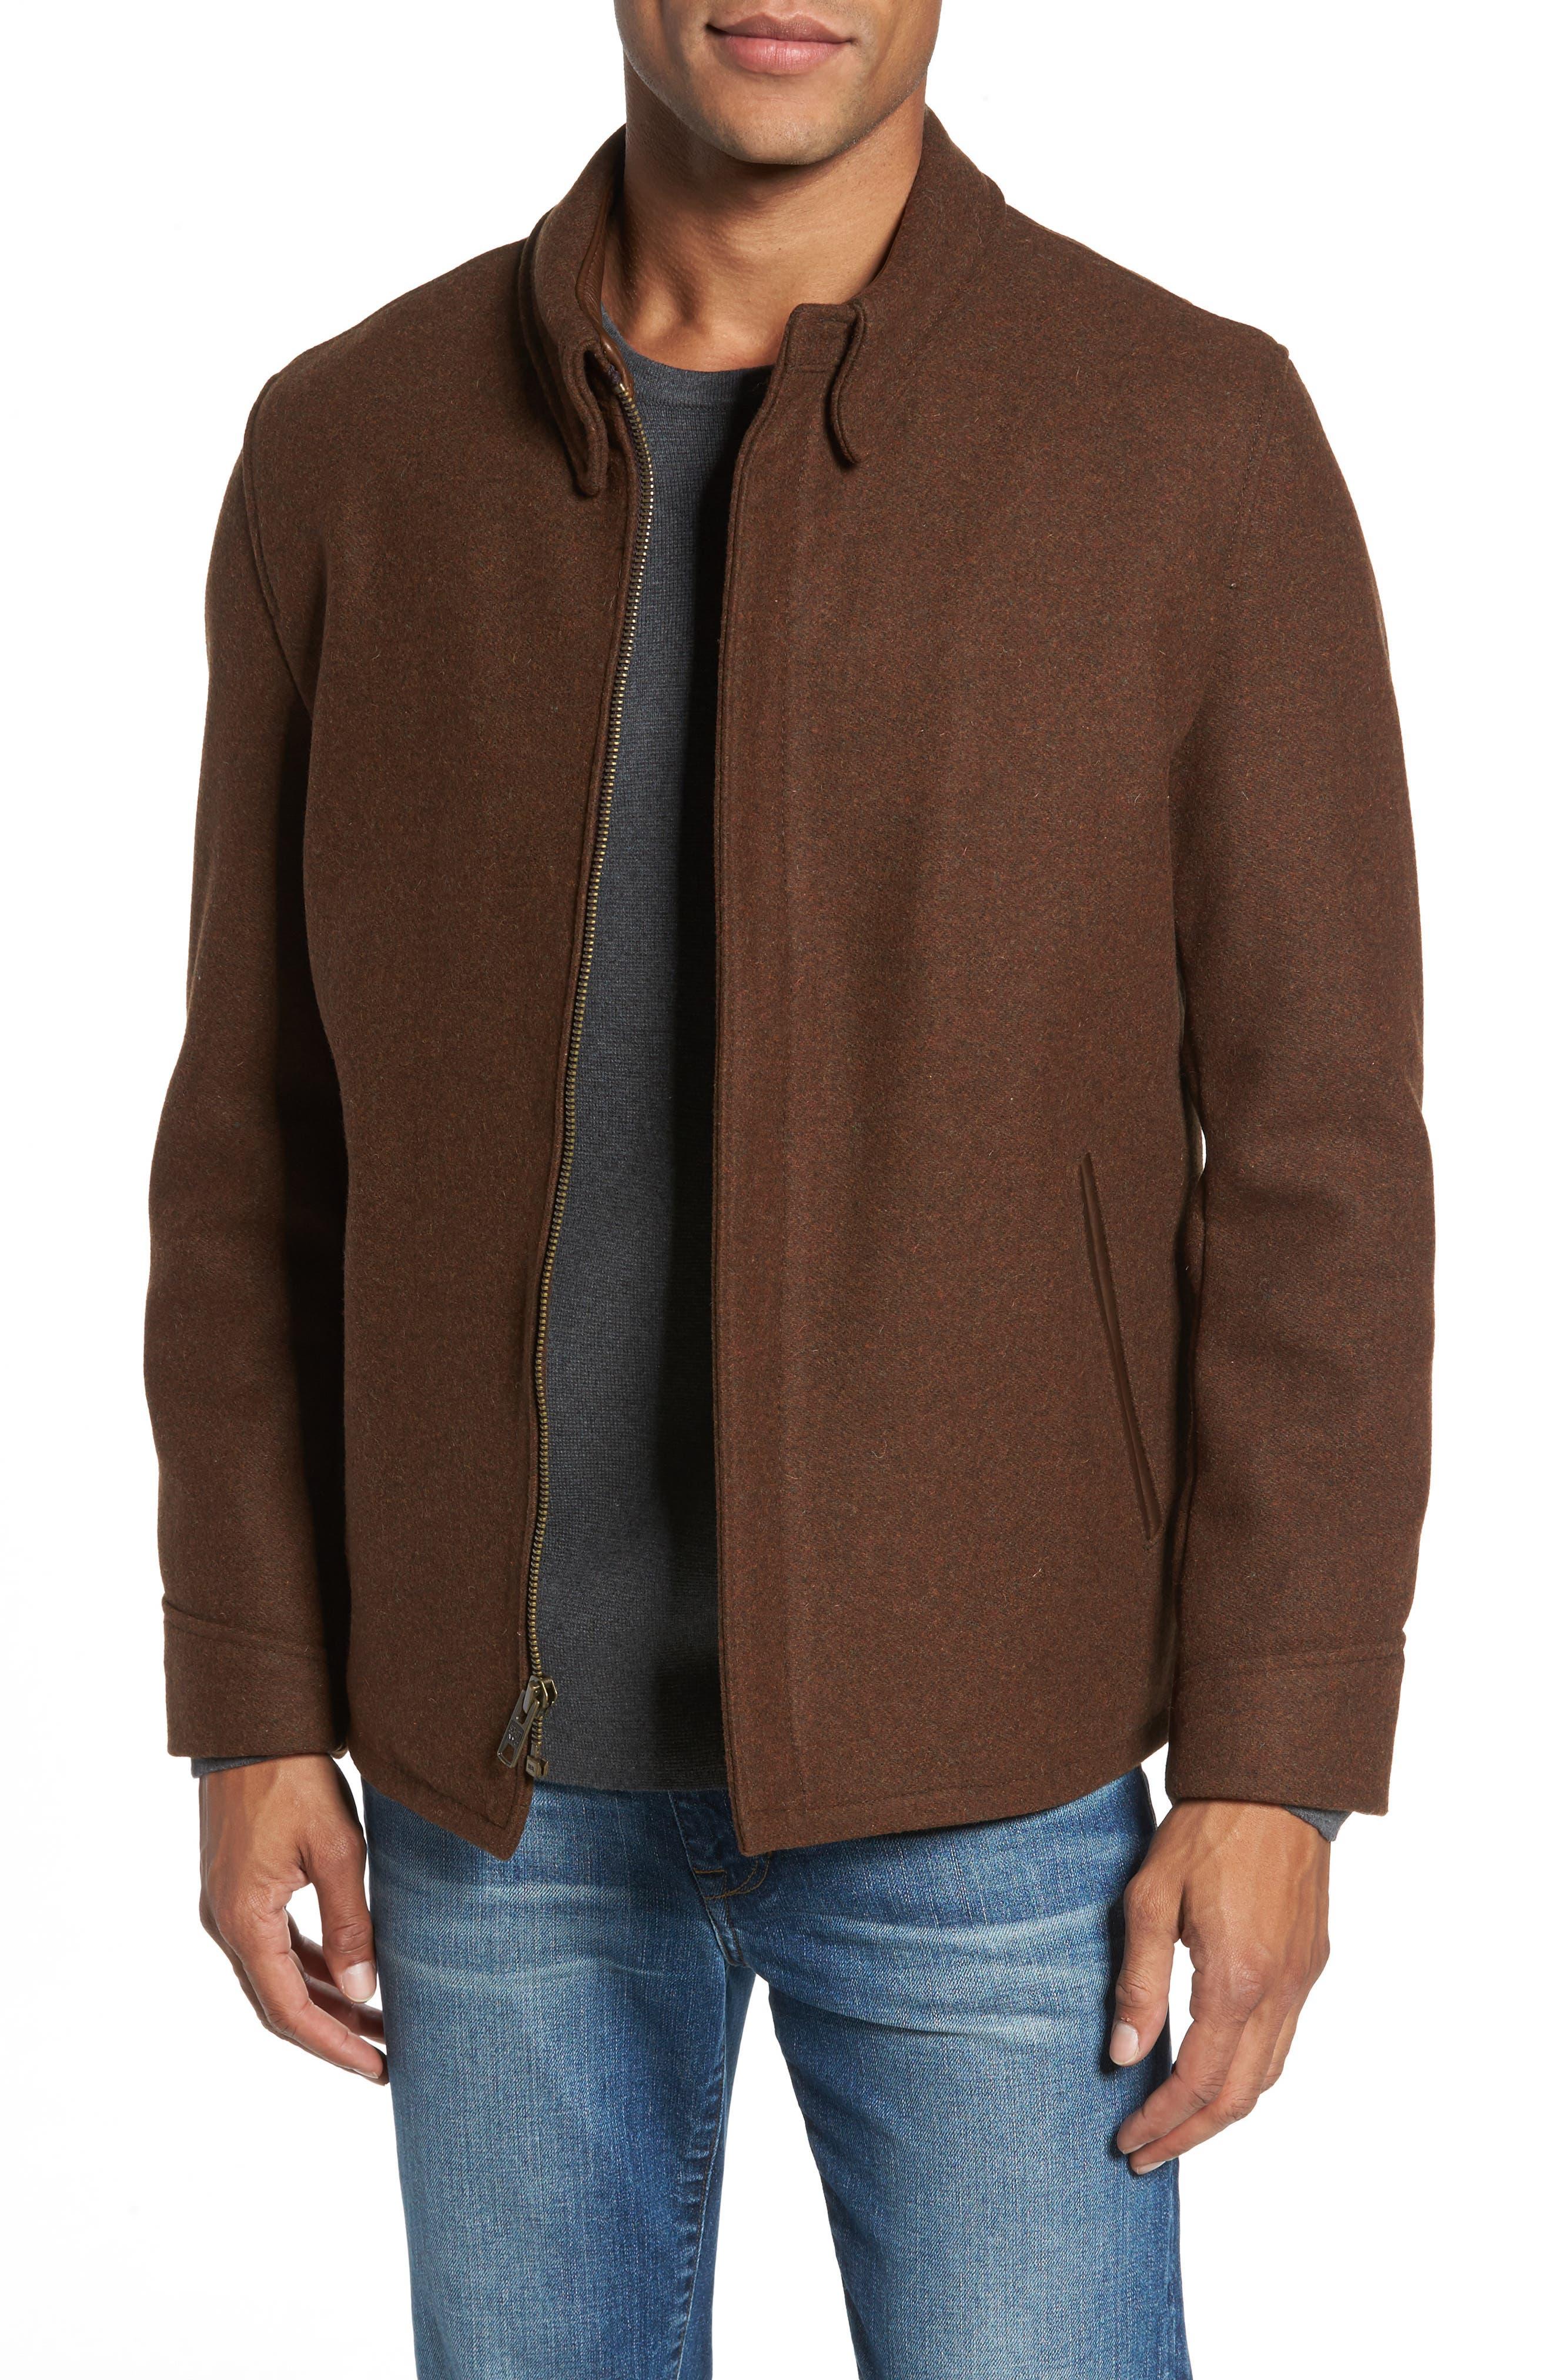 Liberty Wool Blend Zip Front Jacket,                         Main,                         color, 200